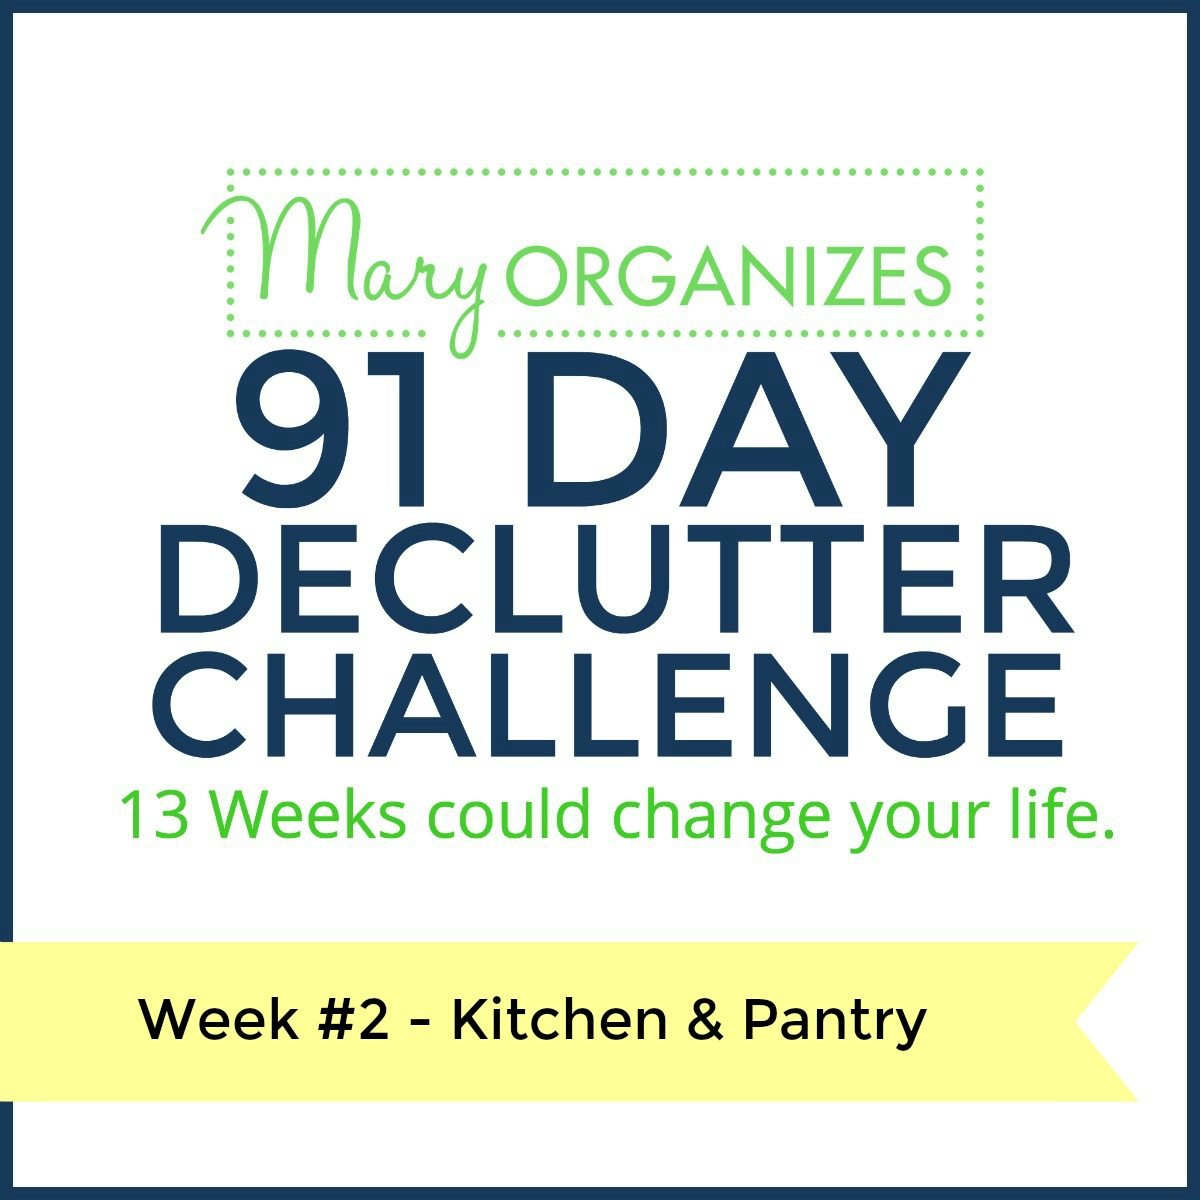 week-2-91-day-declutter-challenge-s